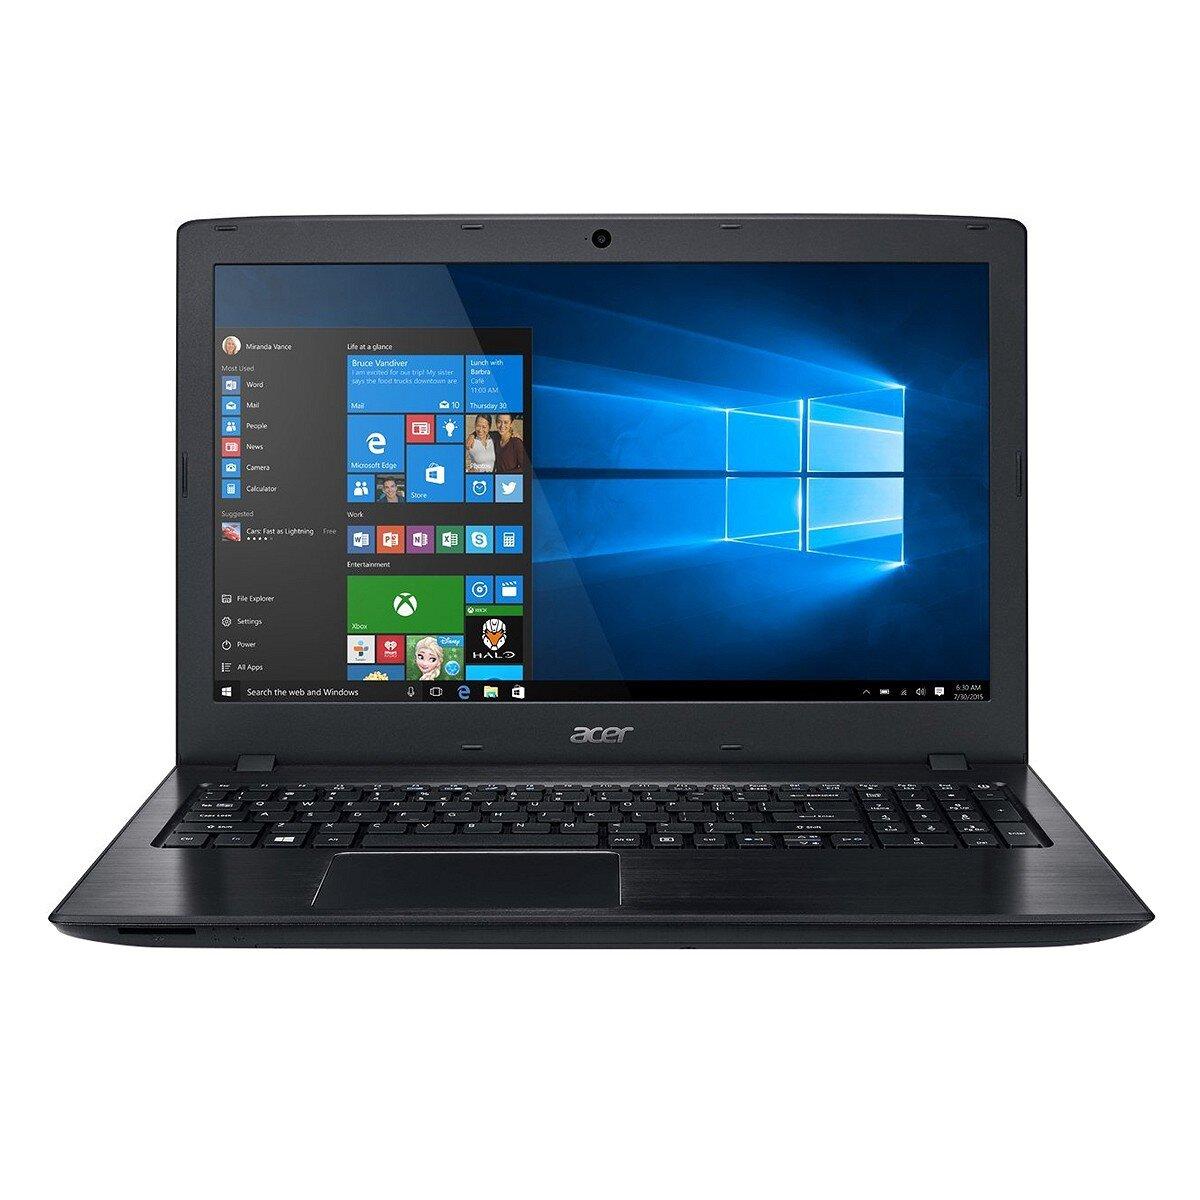 Laptop Acer Aspire E5-575G-50TH  - Intel Core i5 7200U, RAM 4GB, HDD 500GB, Intel NVIDIA GeForce 940MX , 15.6inch